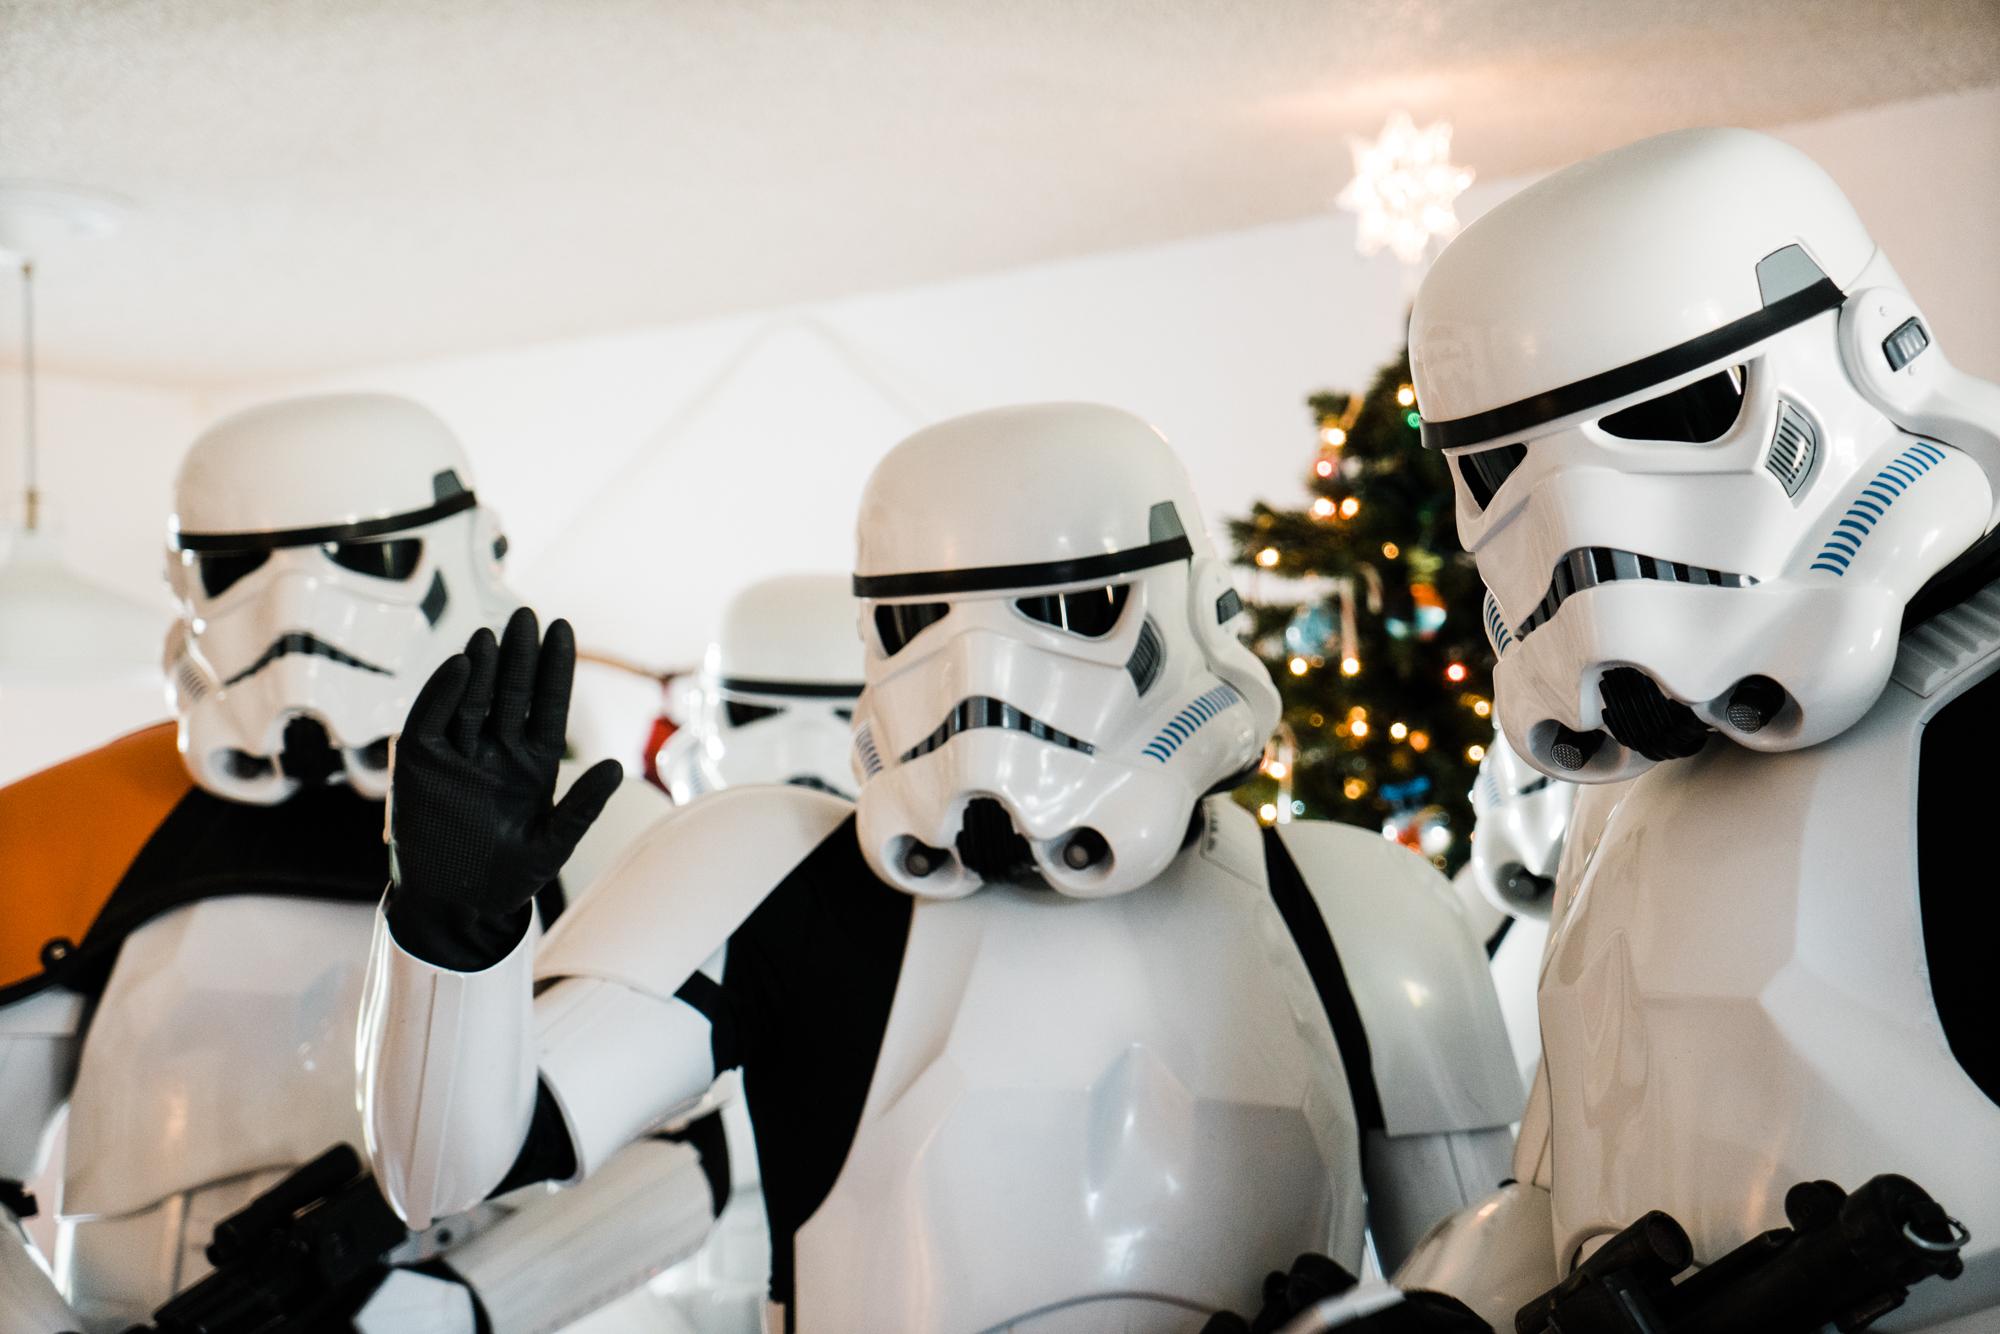 A Star Wars Holiday (Photo Story)-9.jpg